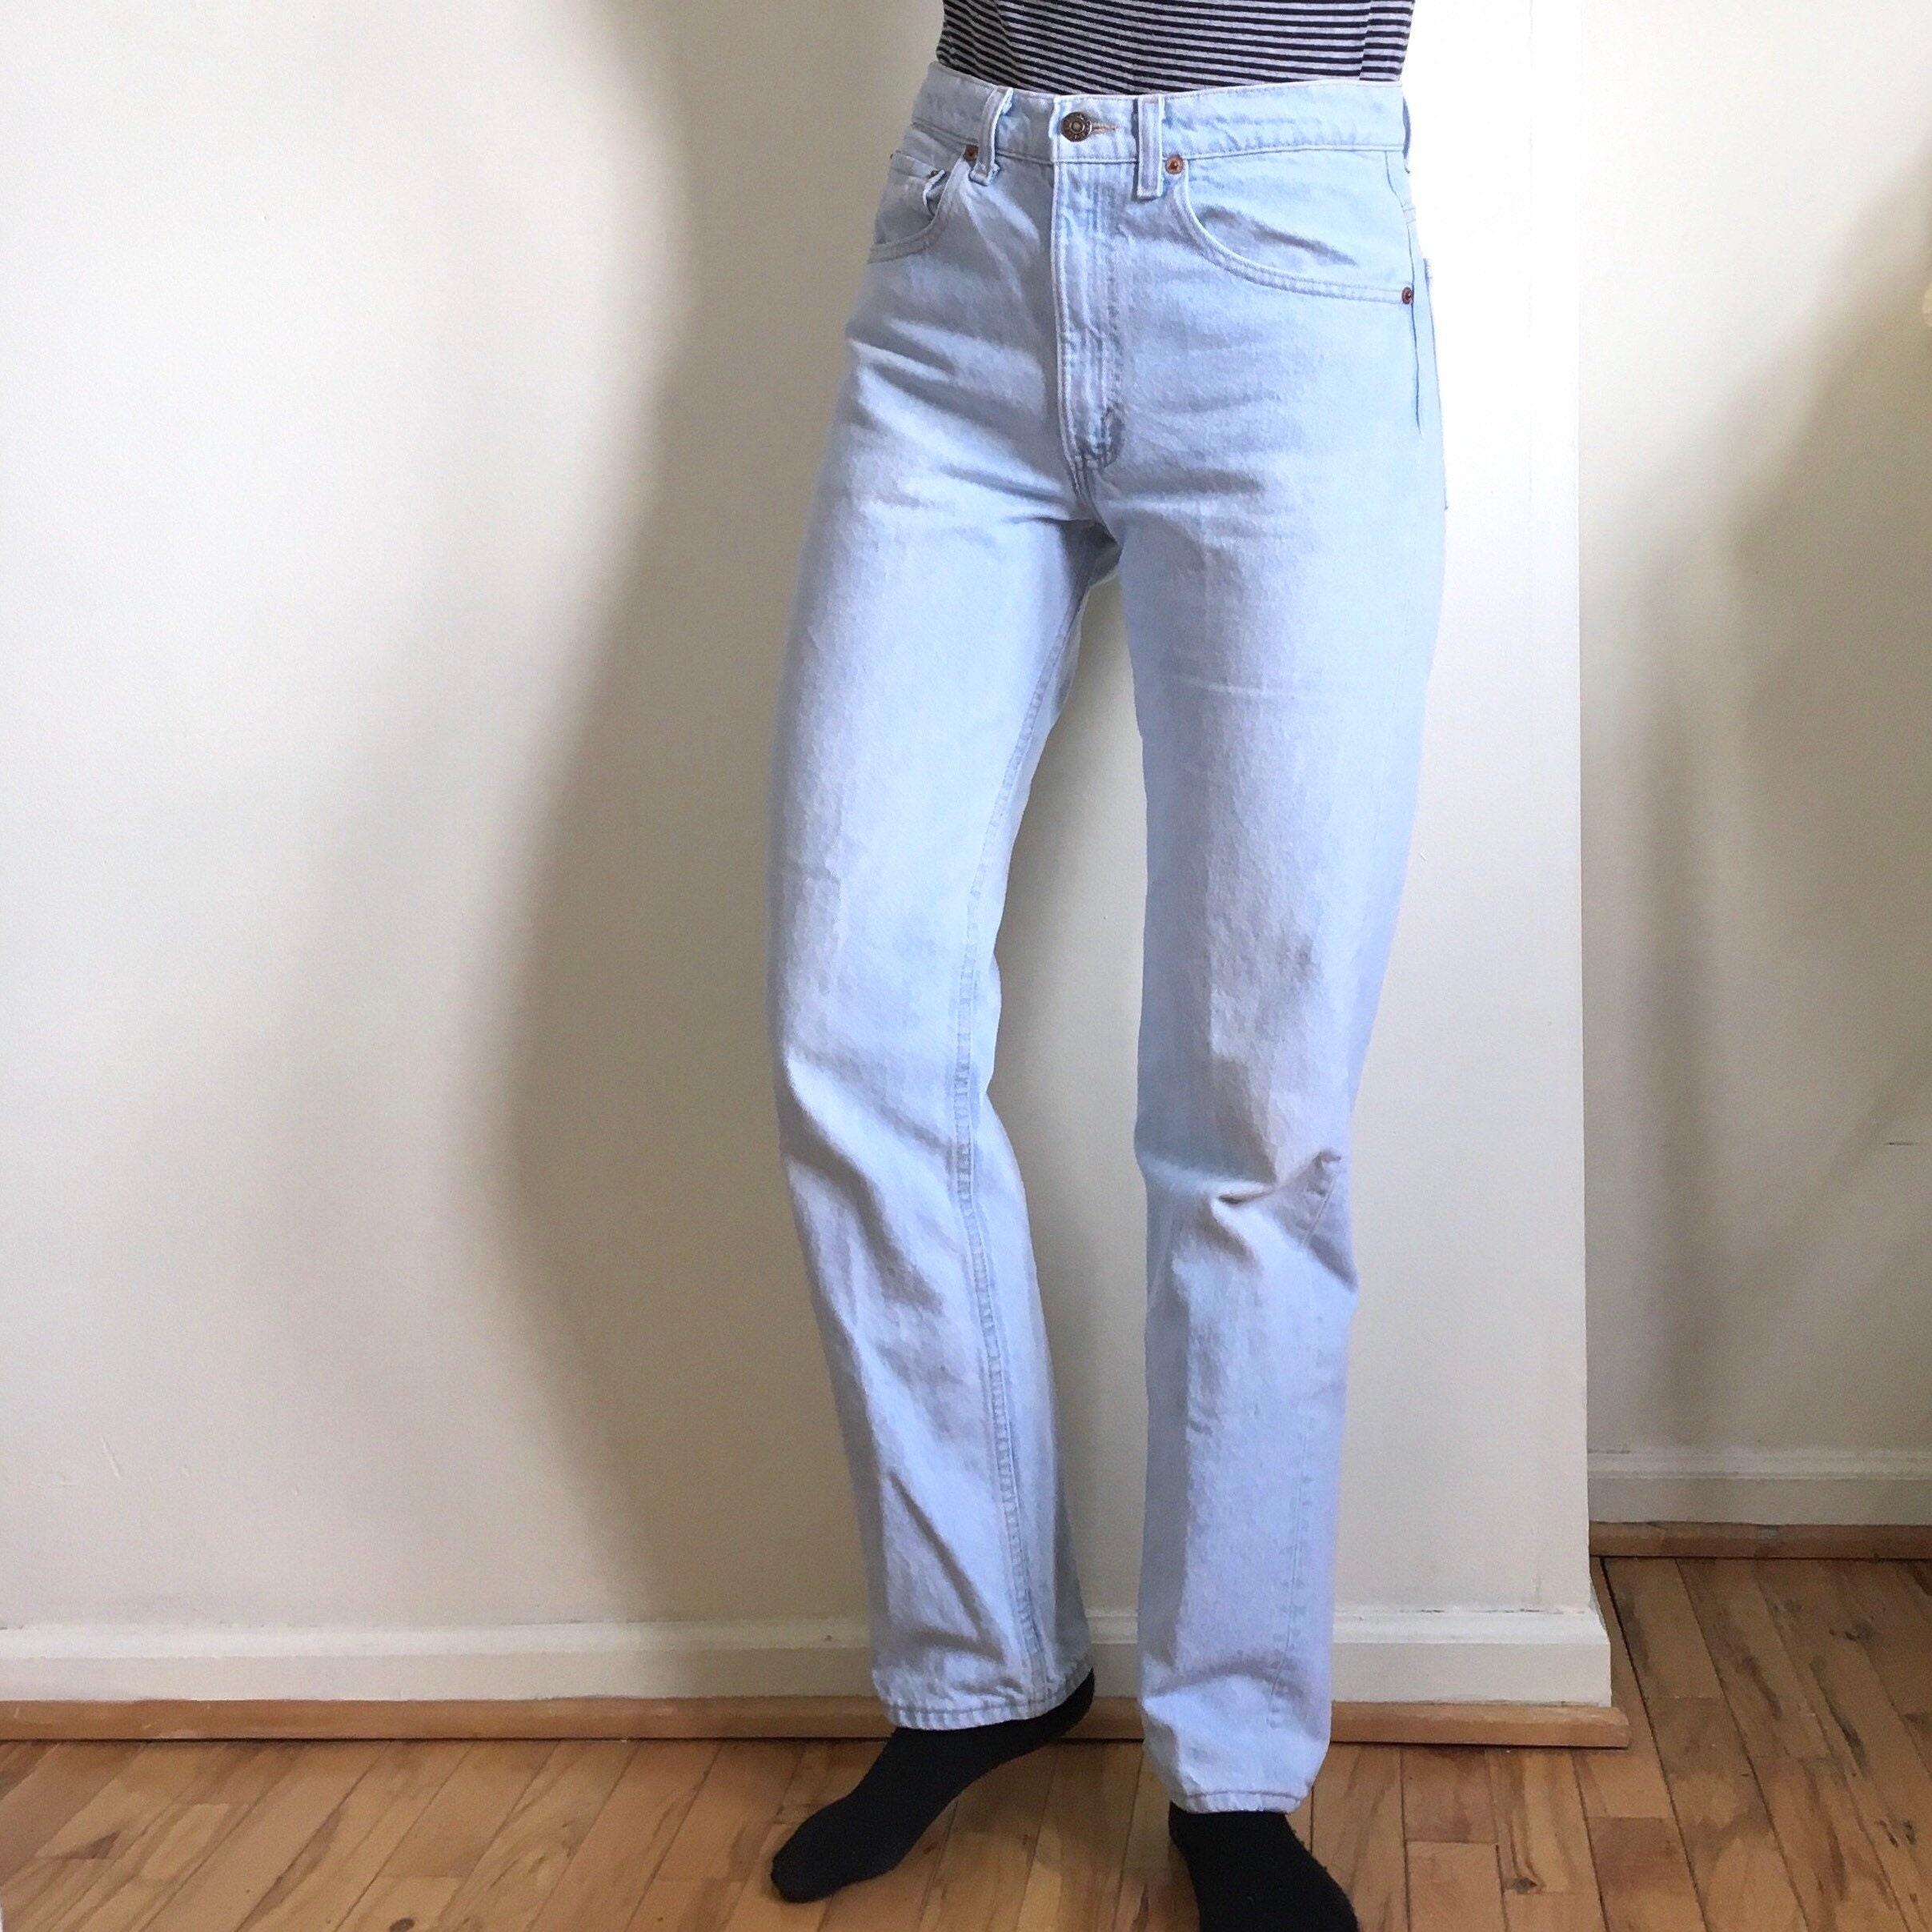 417b4efd5d7 Vtg. Levi 505 XX 30 W High Waist Jeans Light Wash